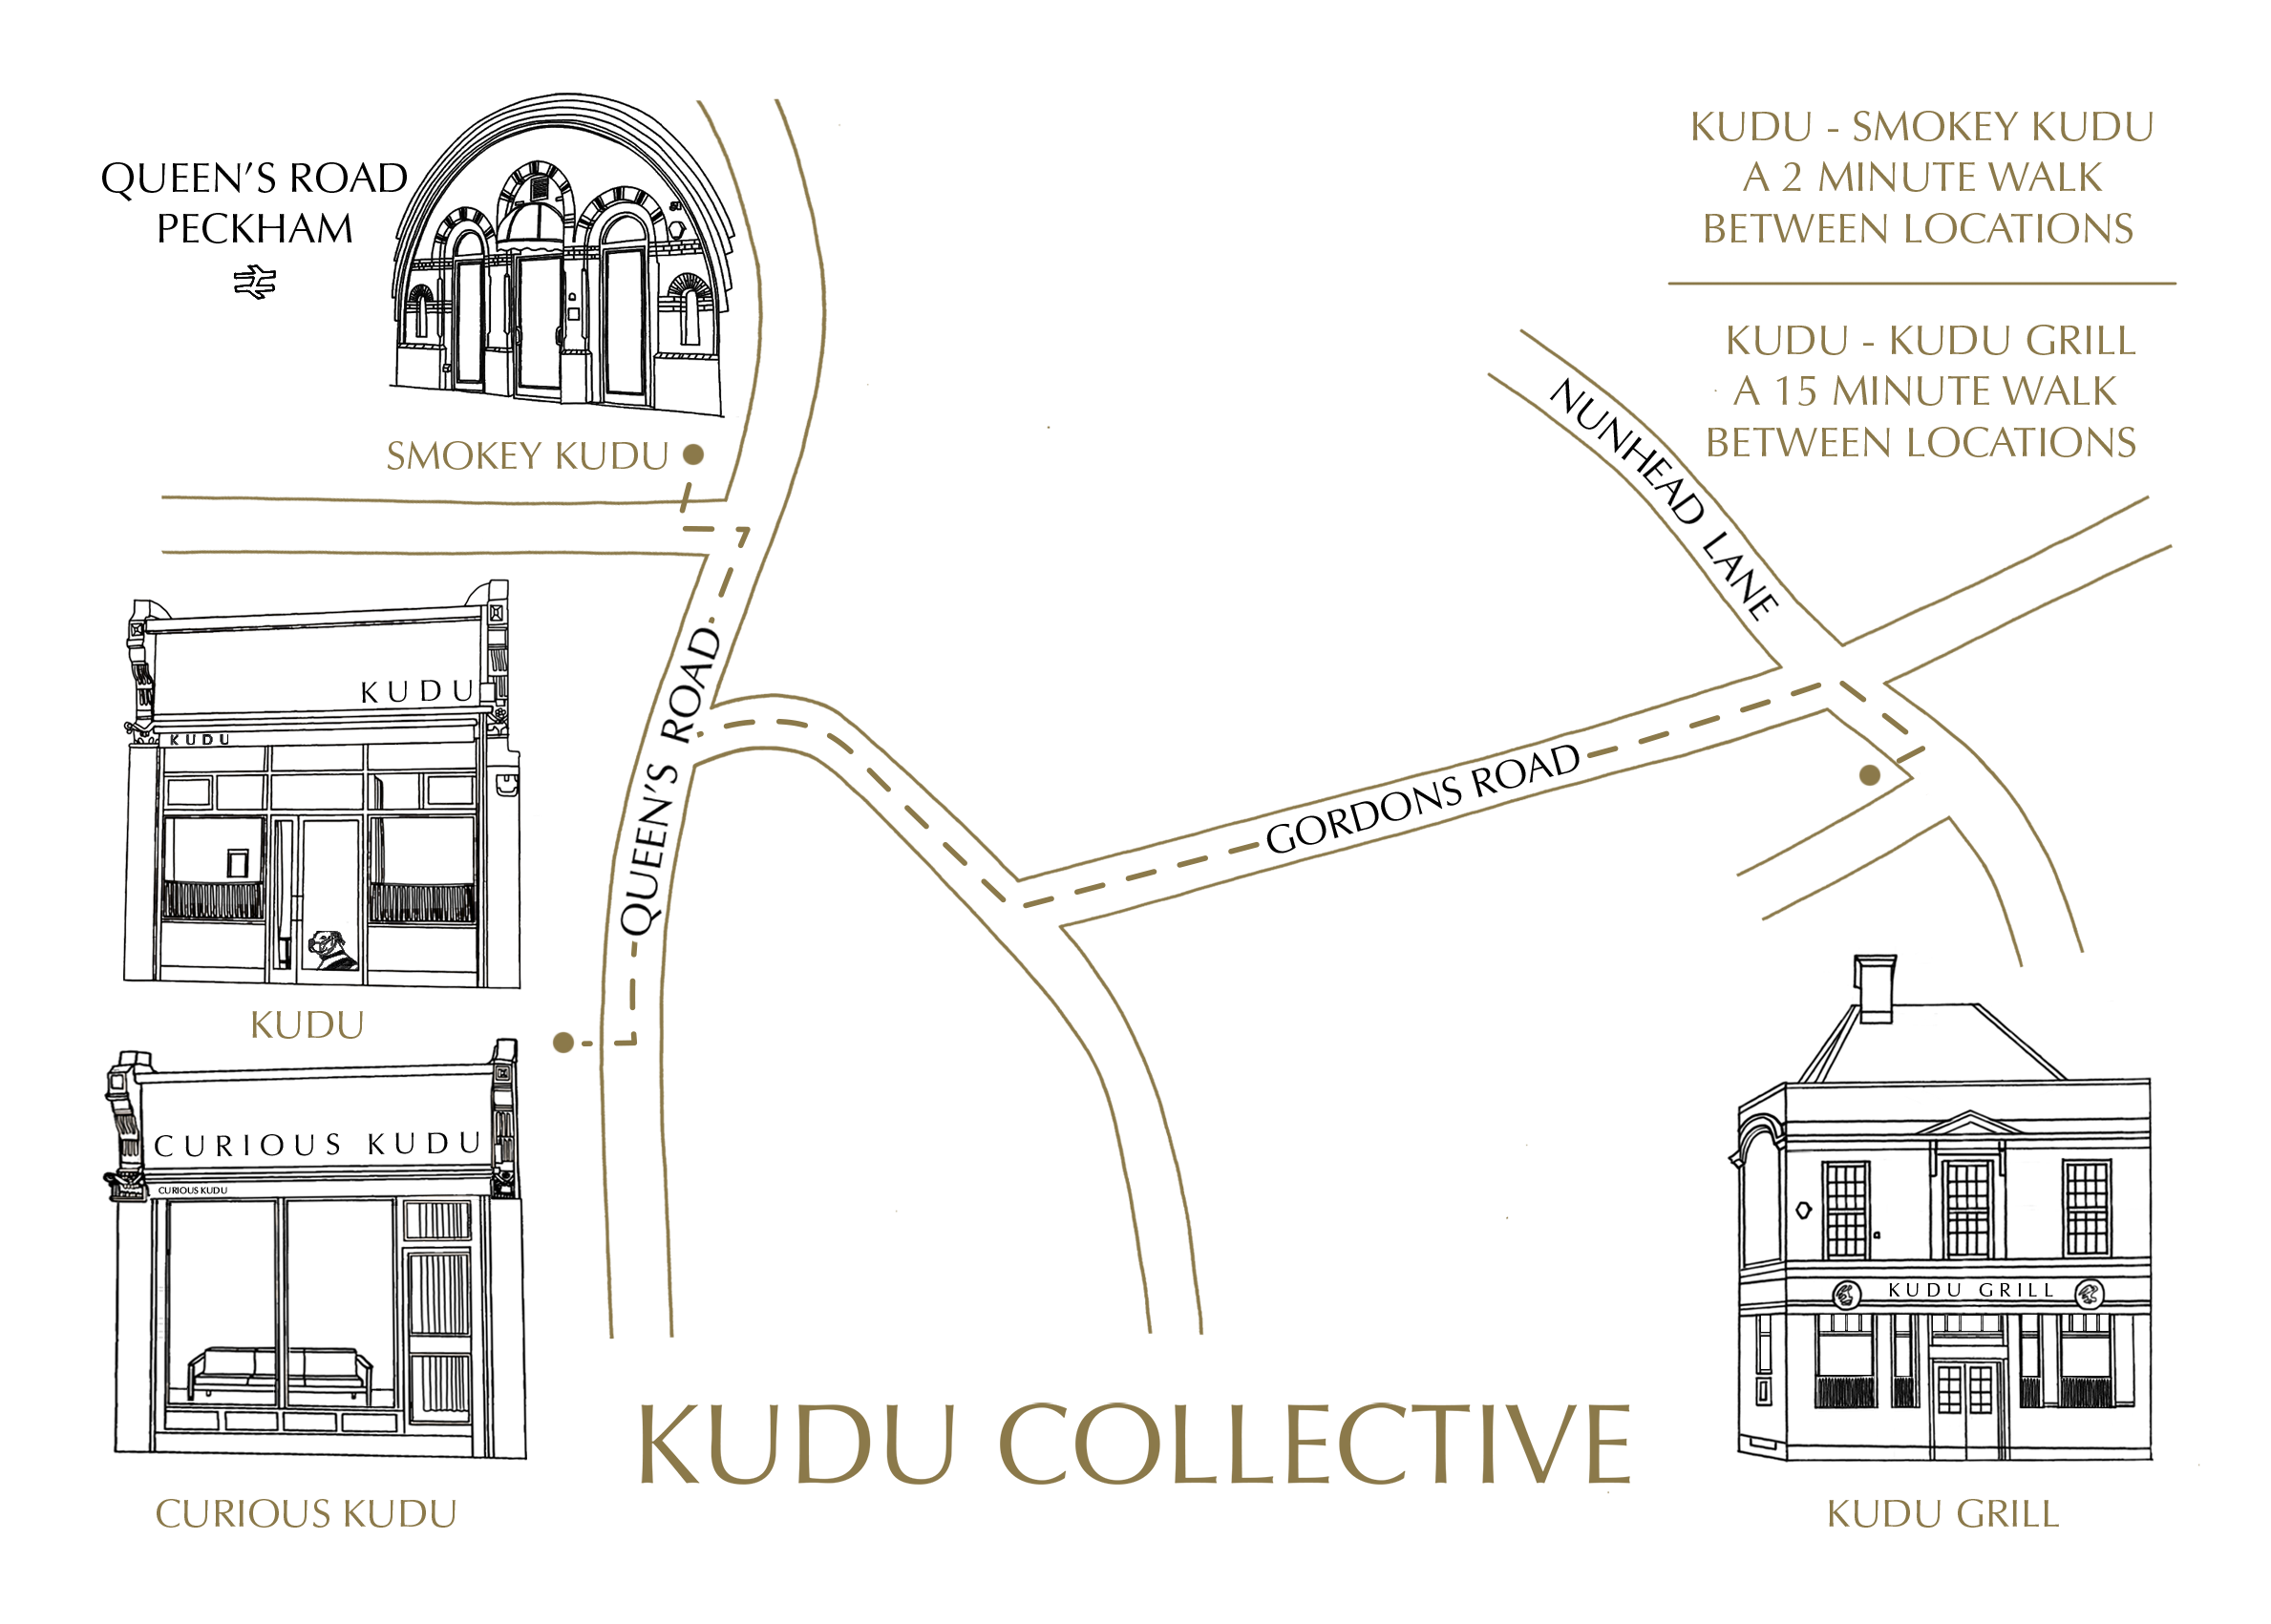 Kudu map